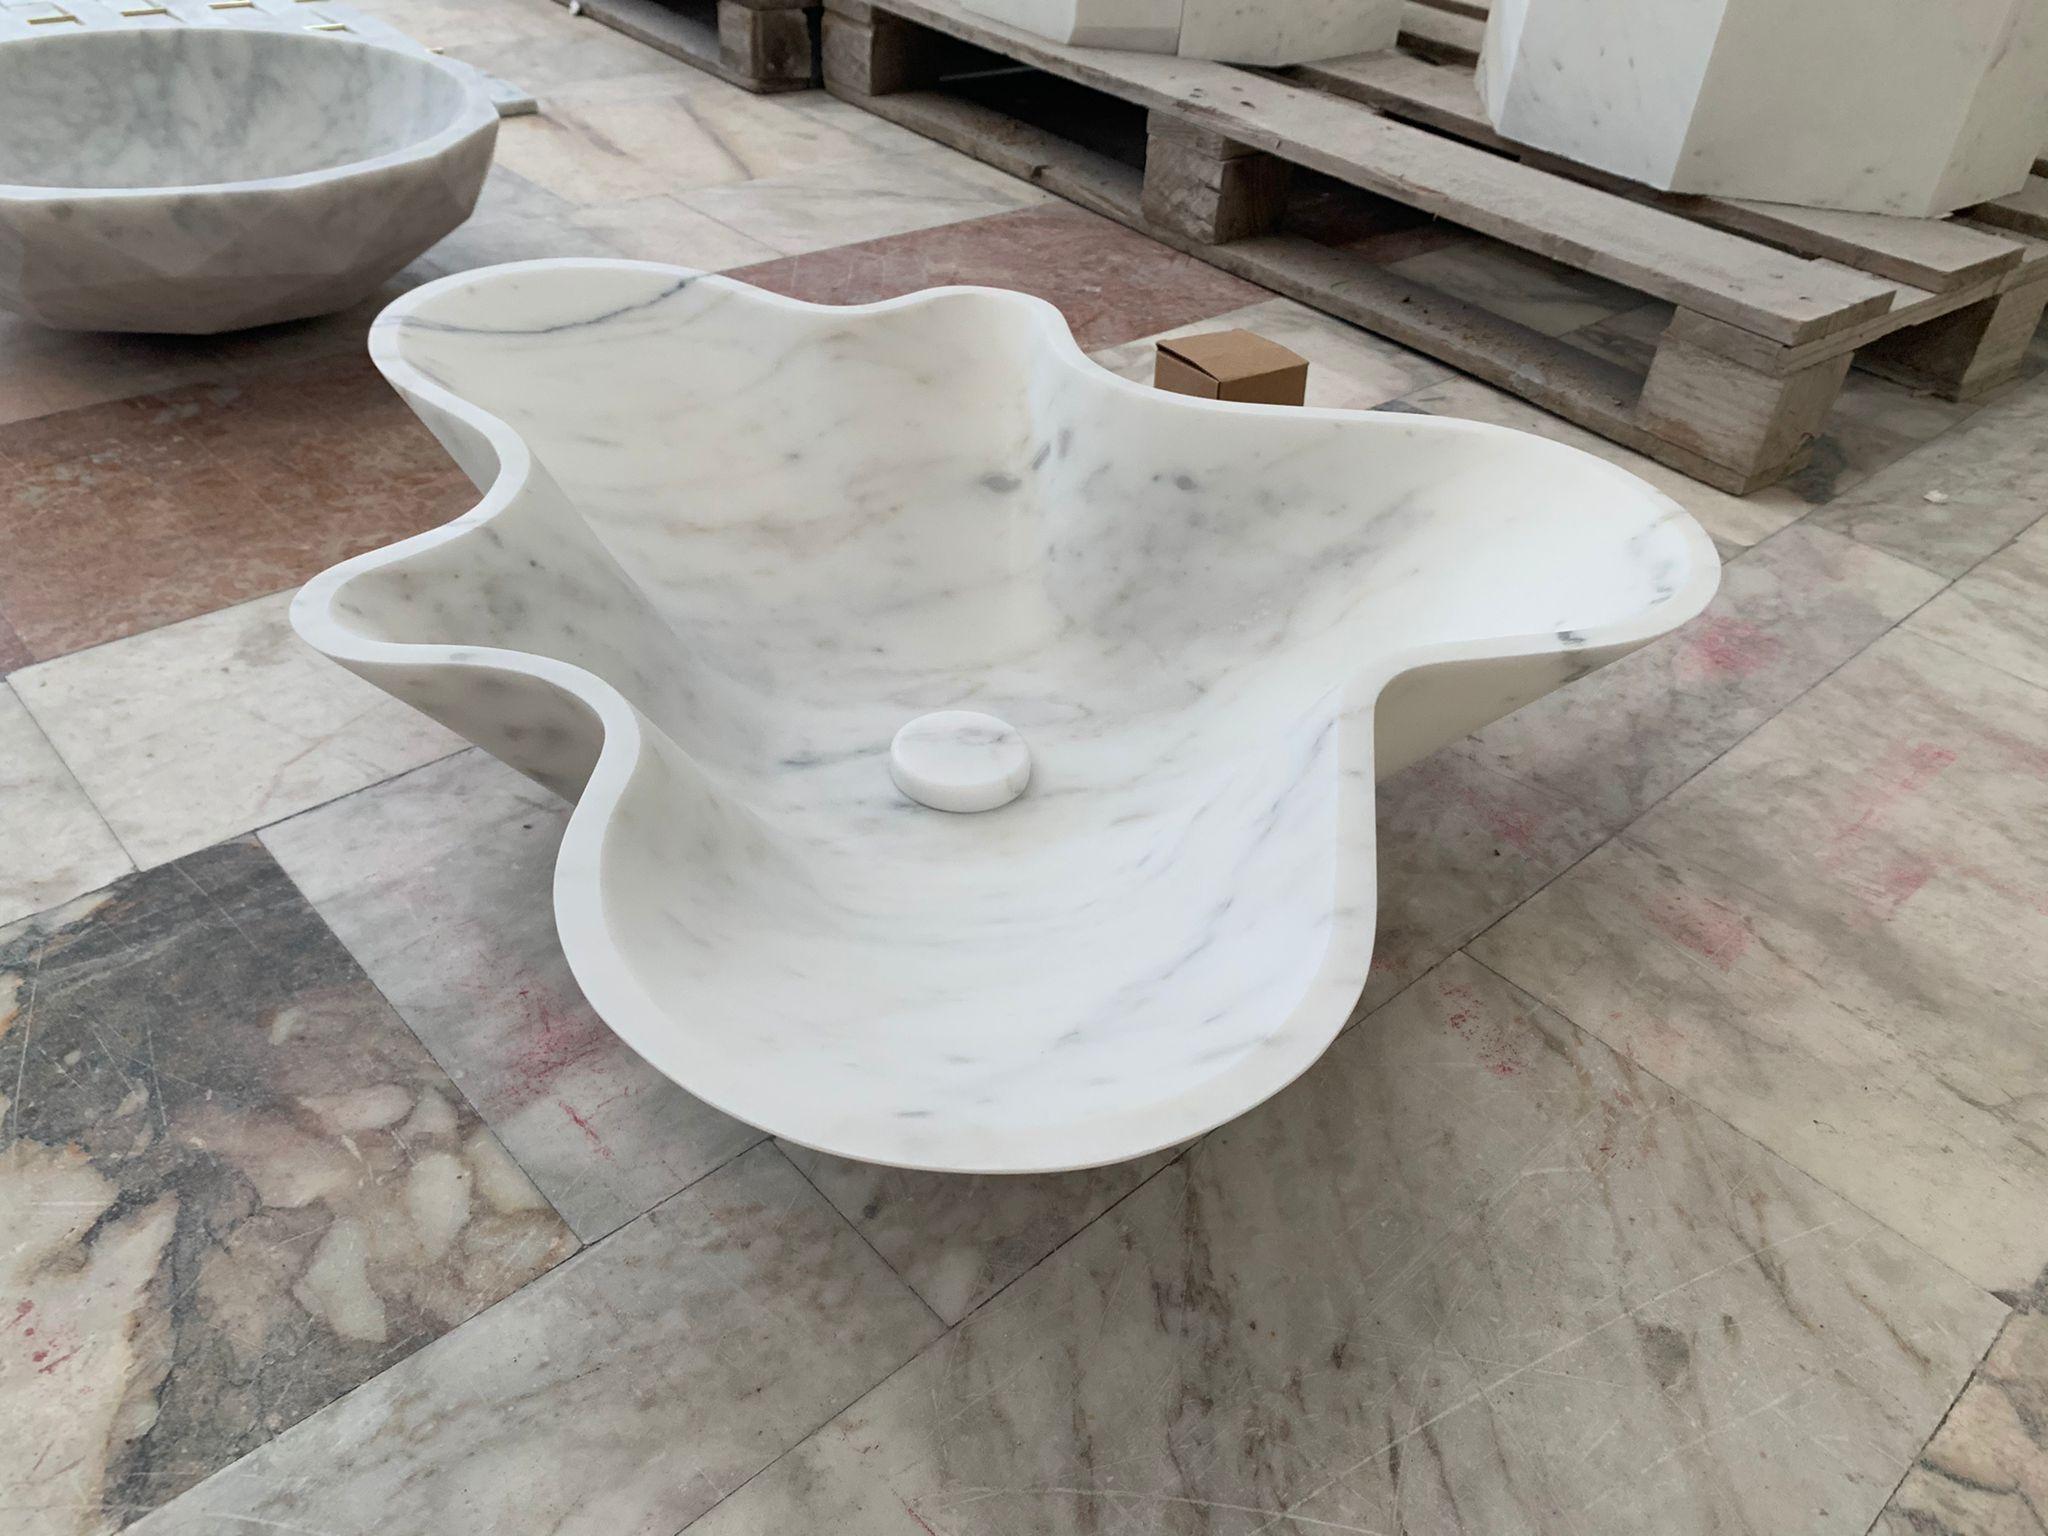 KREOO Nabhi Bowl no.1 in Calacatta Carrara